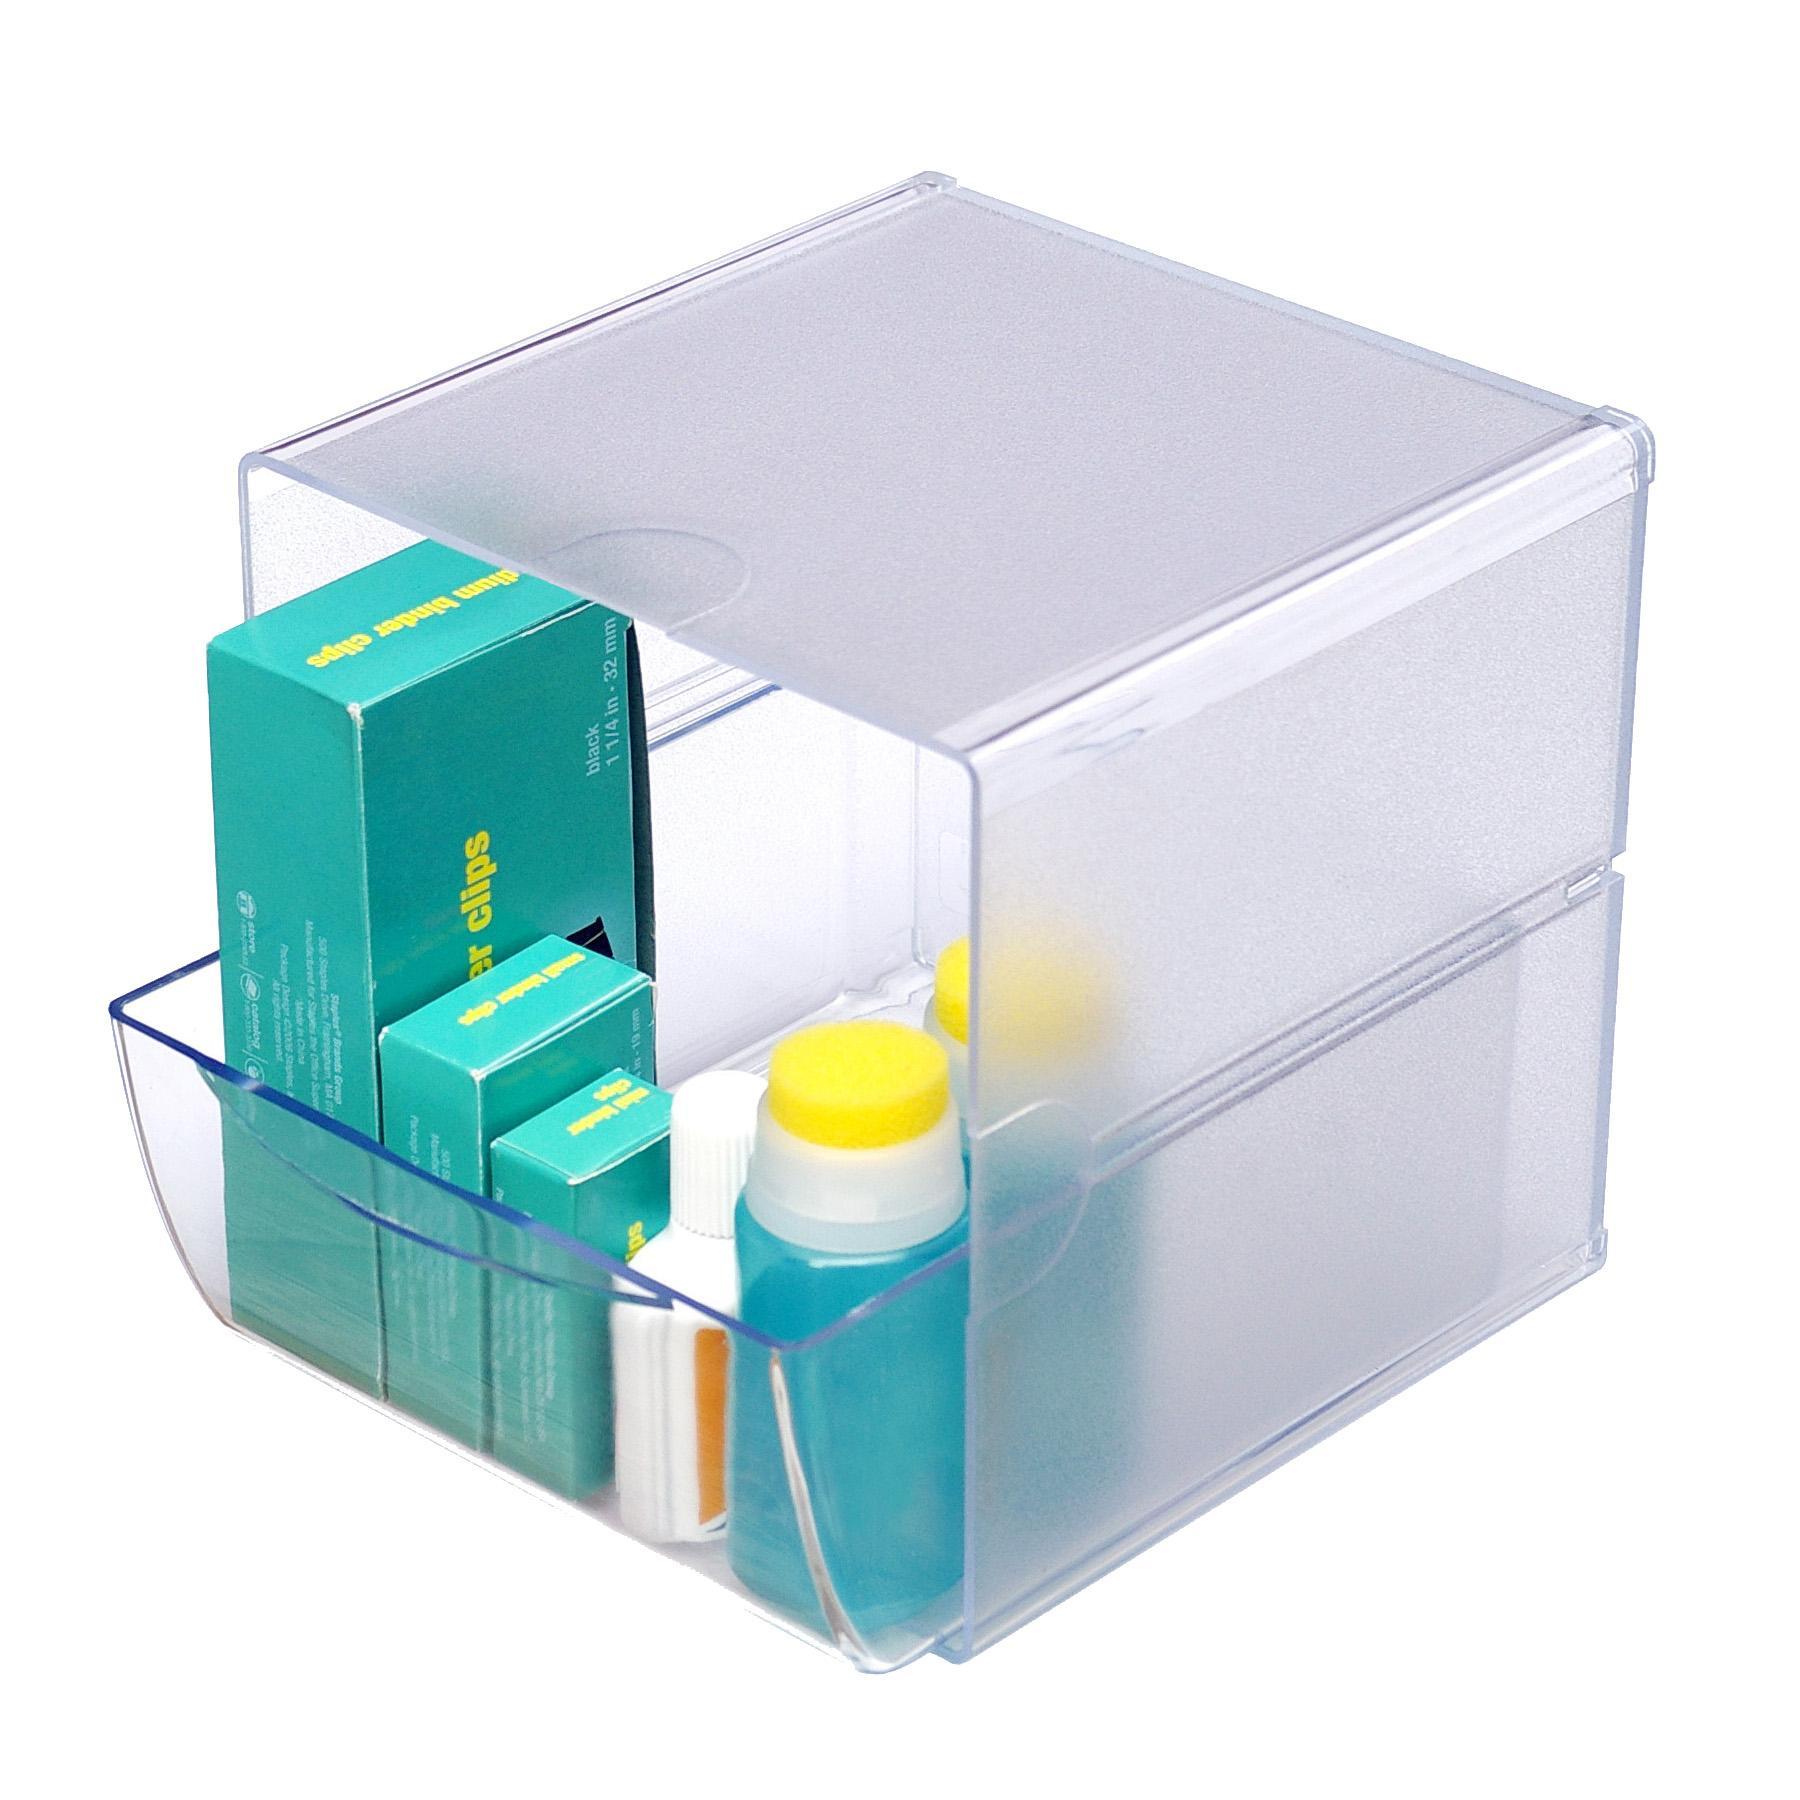 Amazon.com : Deflecto Stackable Cube Organizer, Desk And